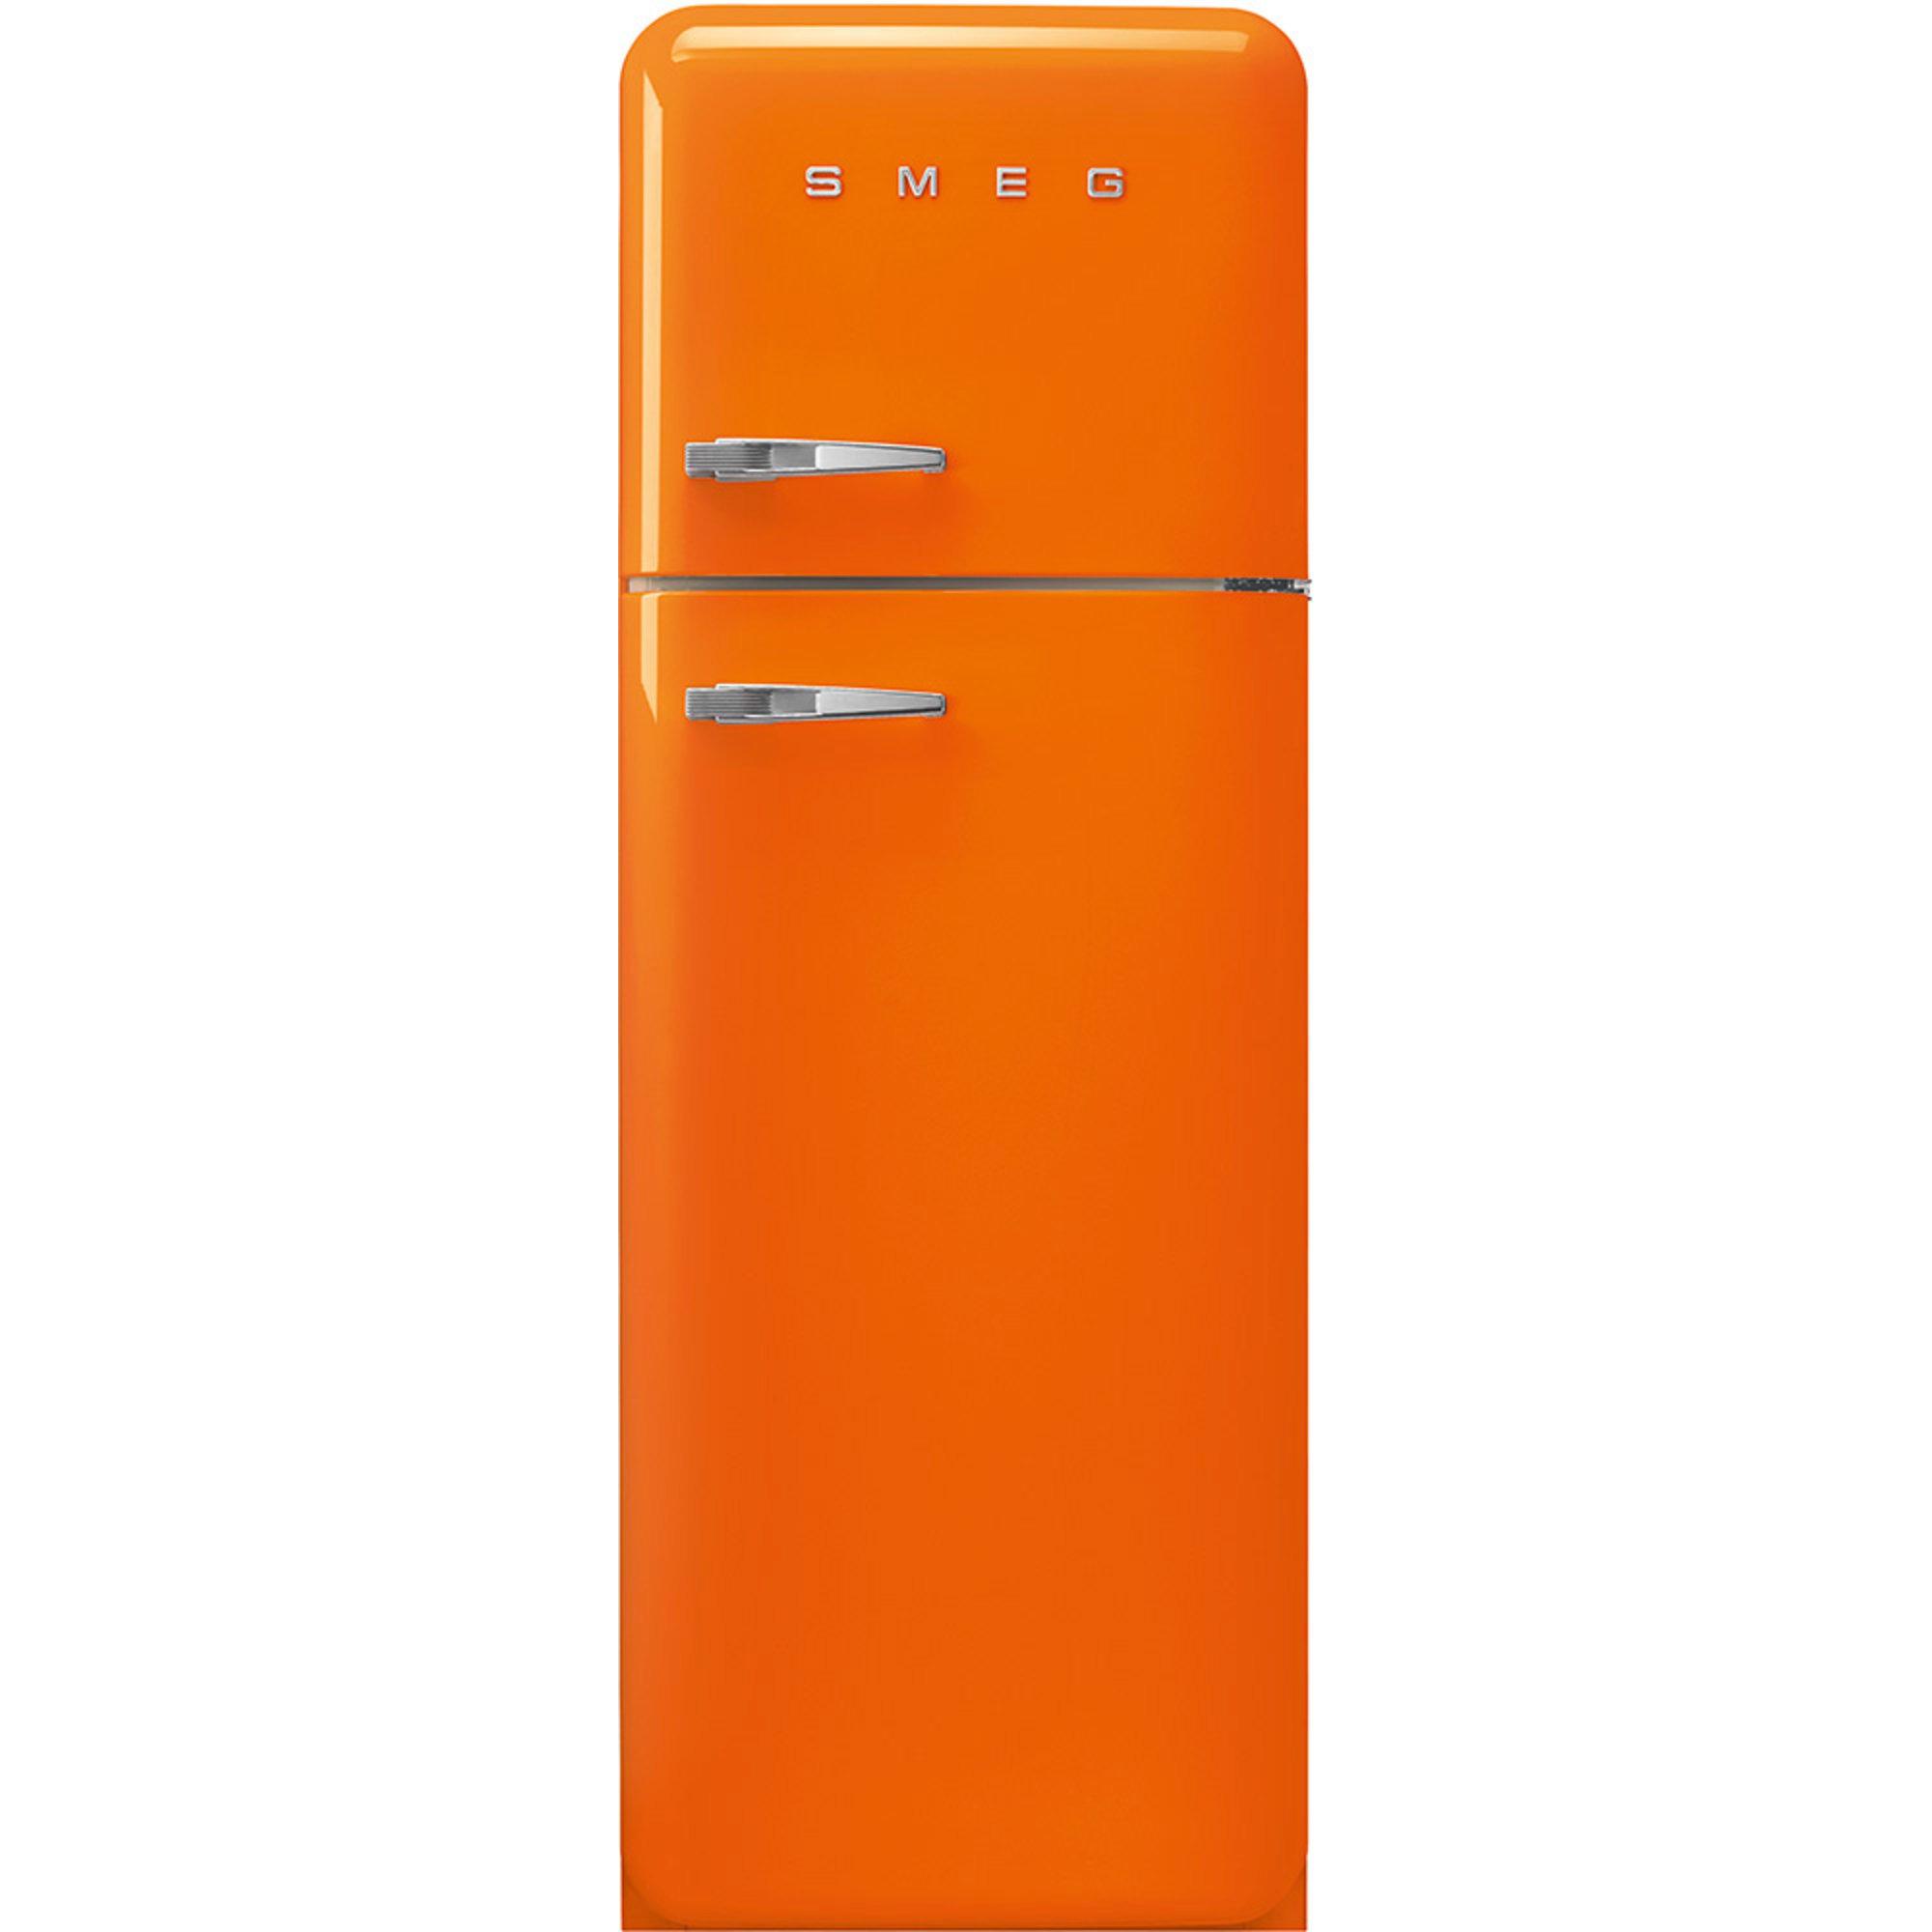 Smeg 172 cm Högerhängt Kylskåp/frys i 50-tals Retro Design Orange